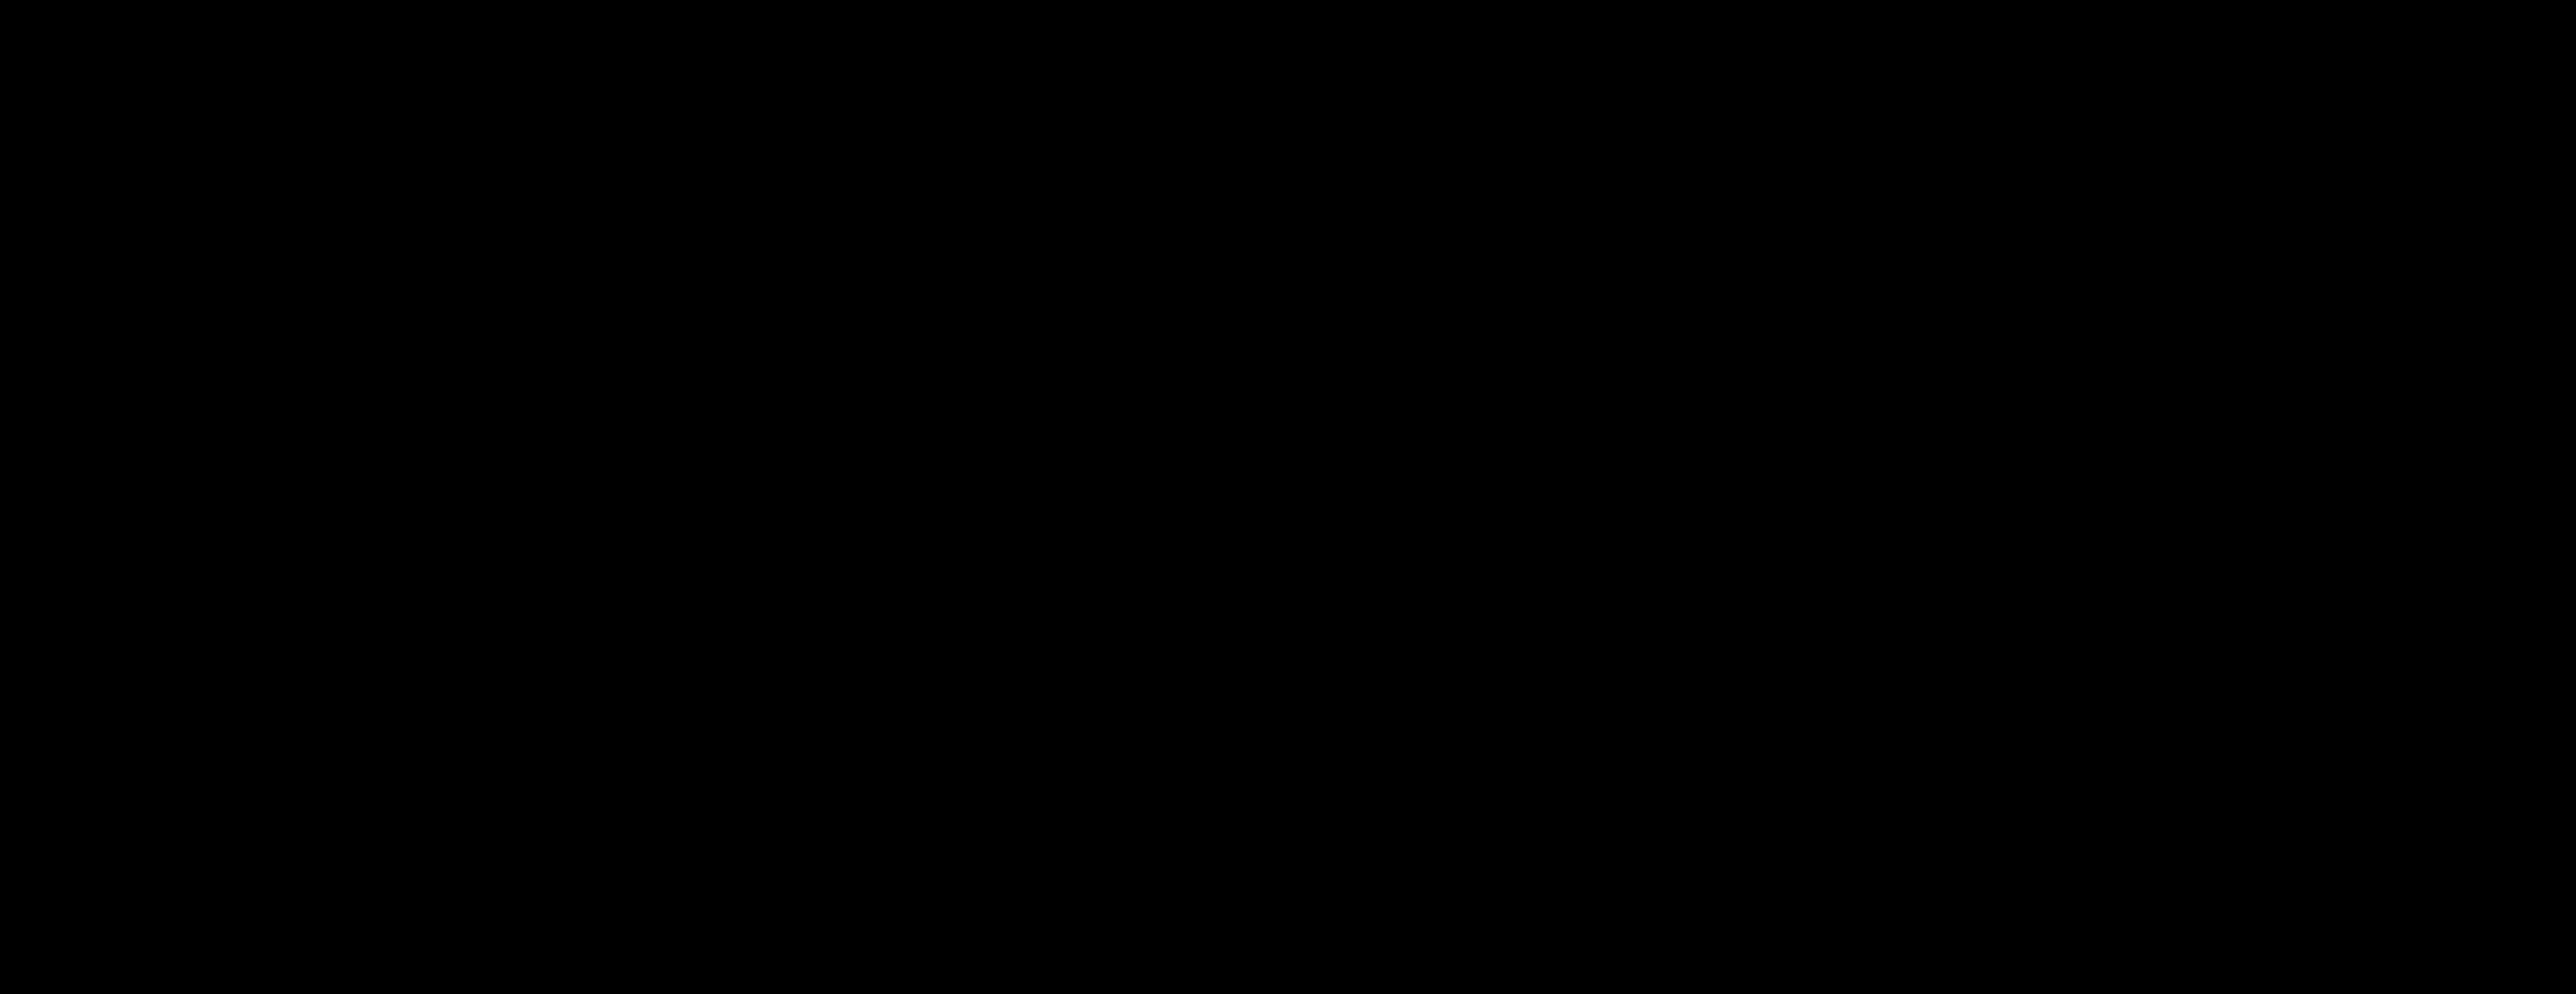 steningelogga svart